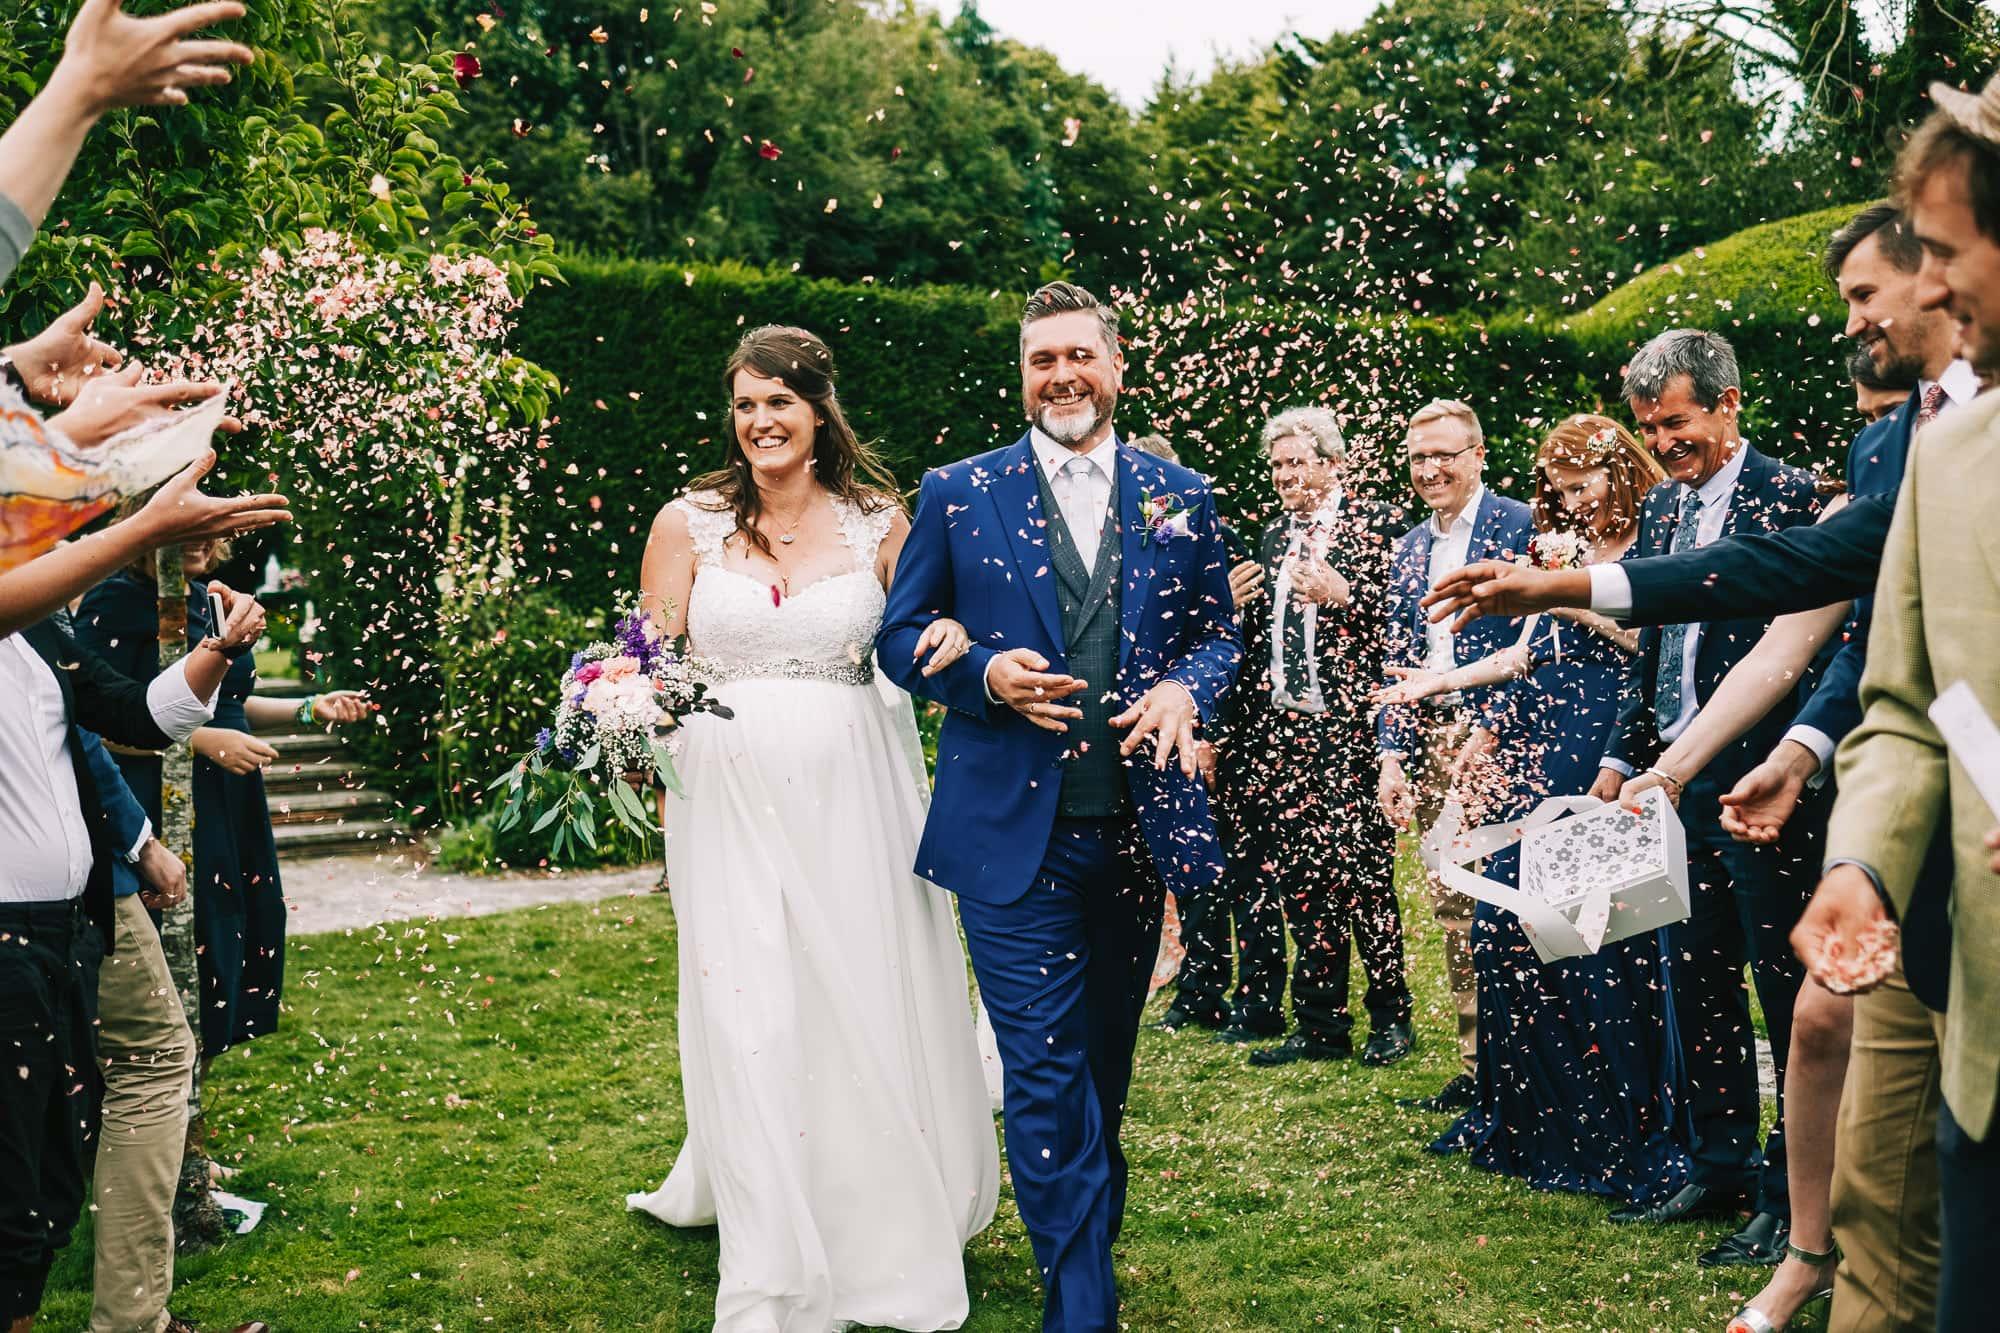 Canterbury Wedding Photographer - Flower girl arrives